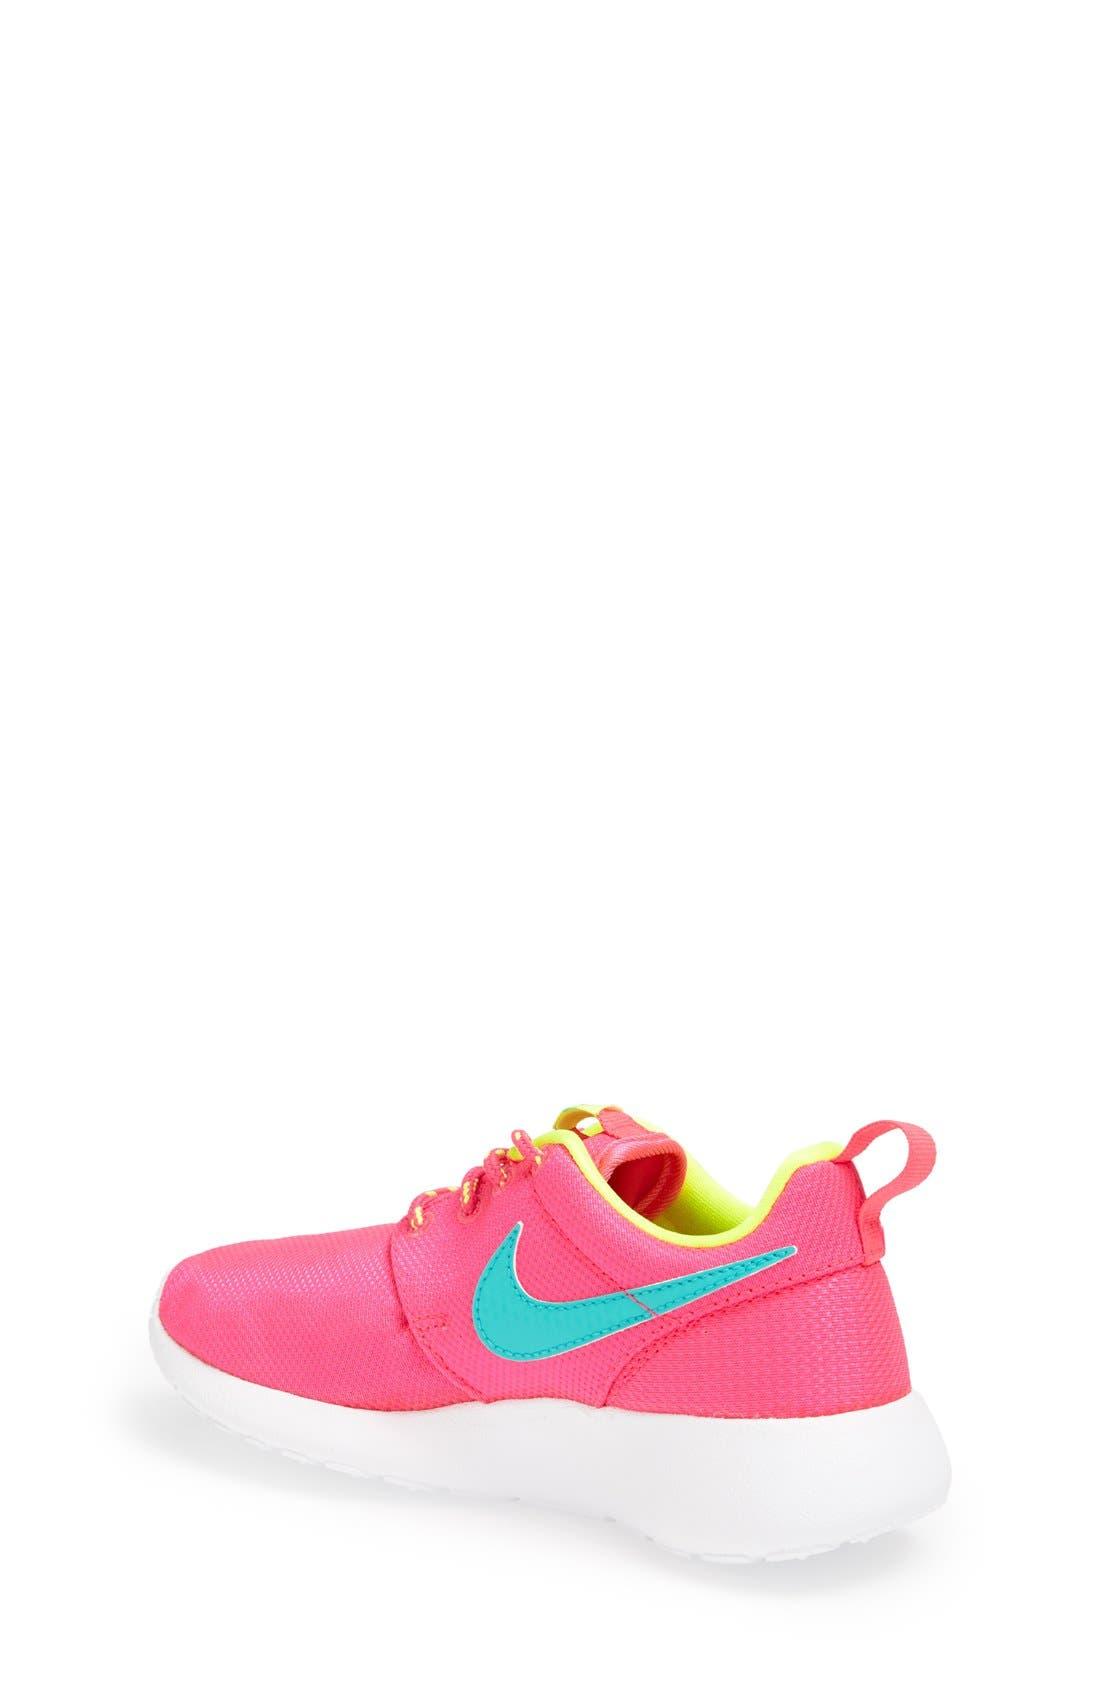 'Roshe Run' Athletic Shoe,                             Alternate thumbnail 140, color,